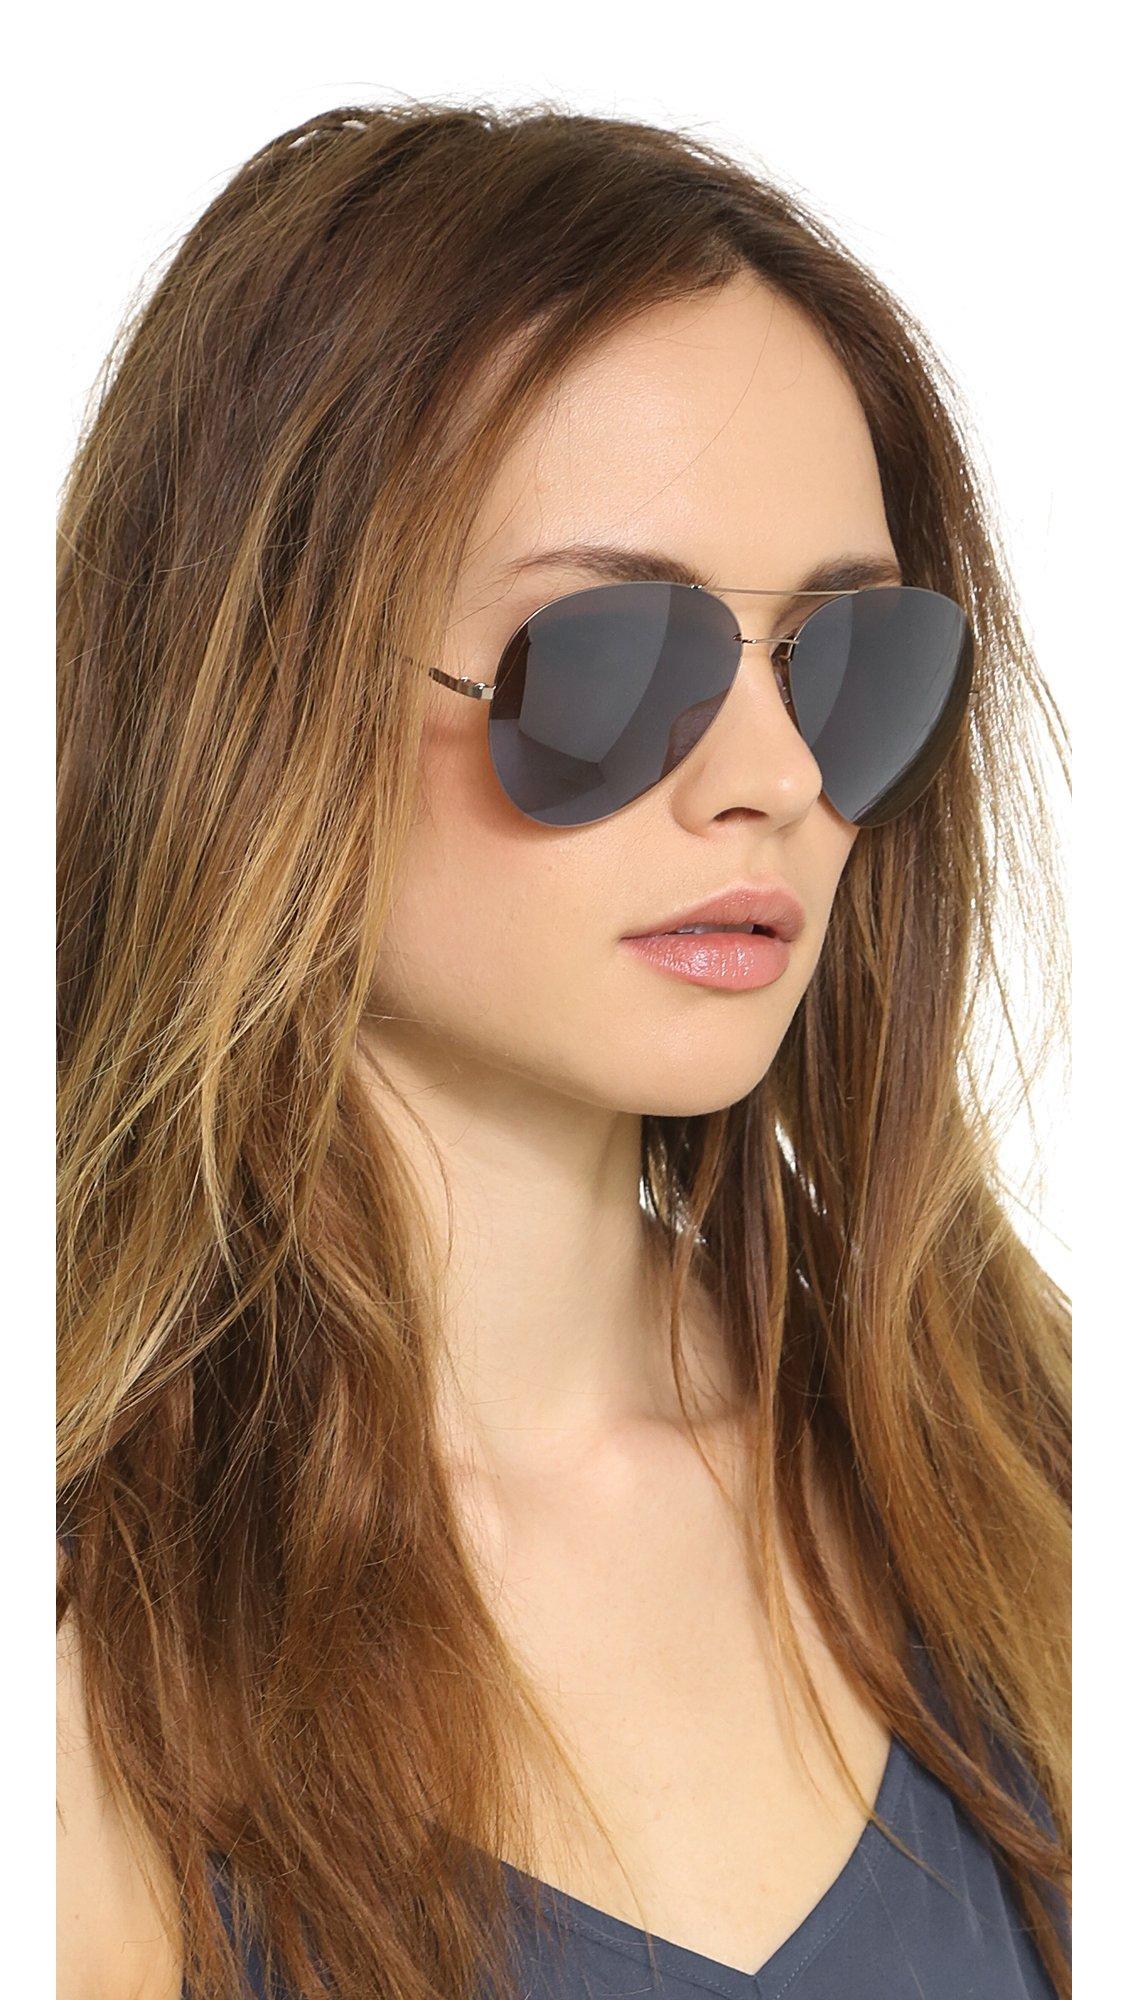 Lyst - Victoria Beckham Feather Aviator Sunglasses